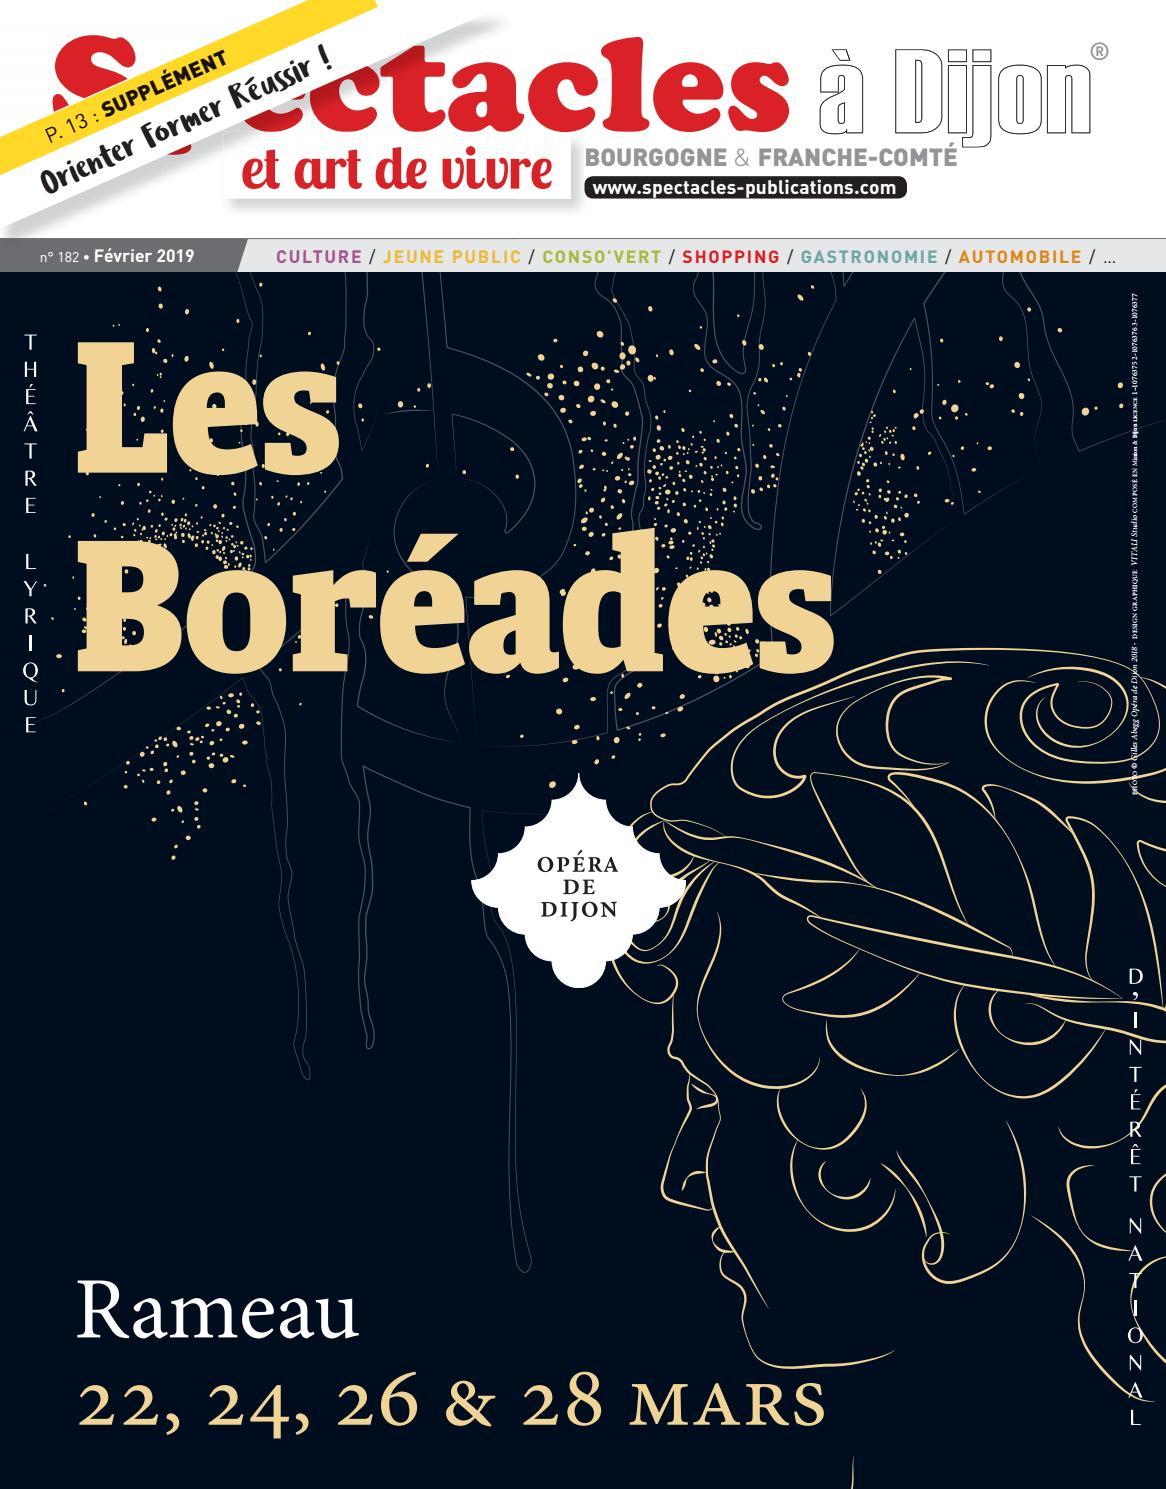 7ad2e157e3 Spectacles Publications Dijon n°182 / Février 2019 by SPECTACLES  PUBLICATIONS - issuu